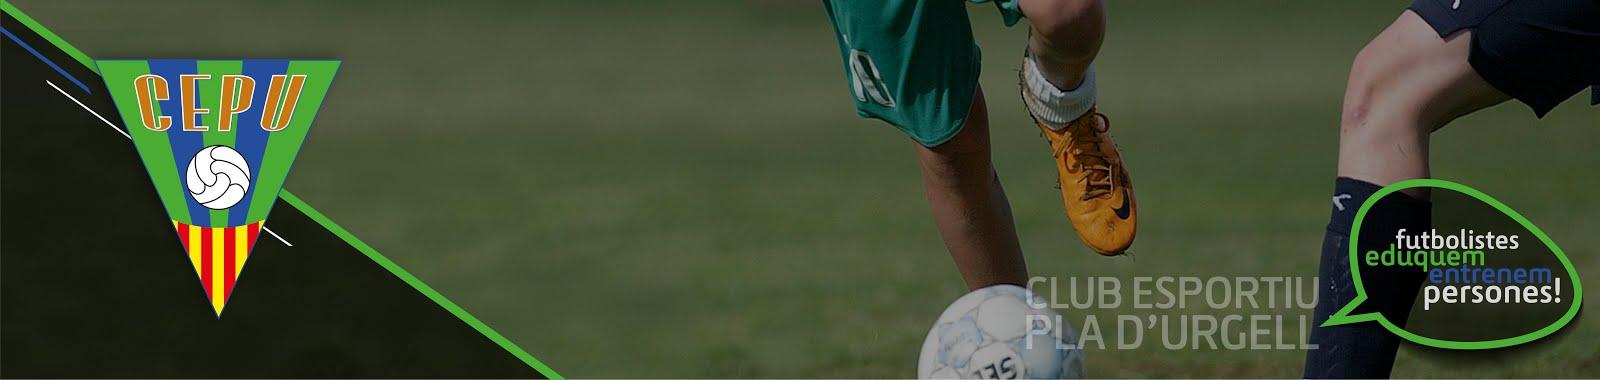 Club Esportiu Pla d'Urgell